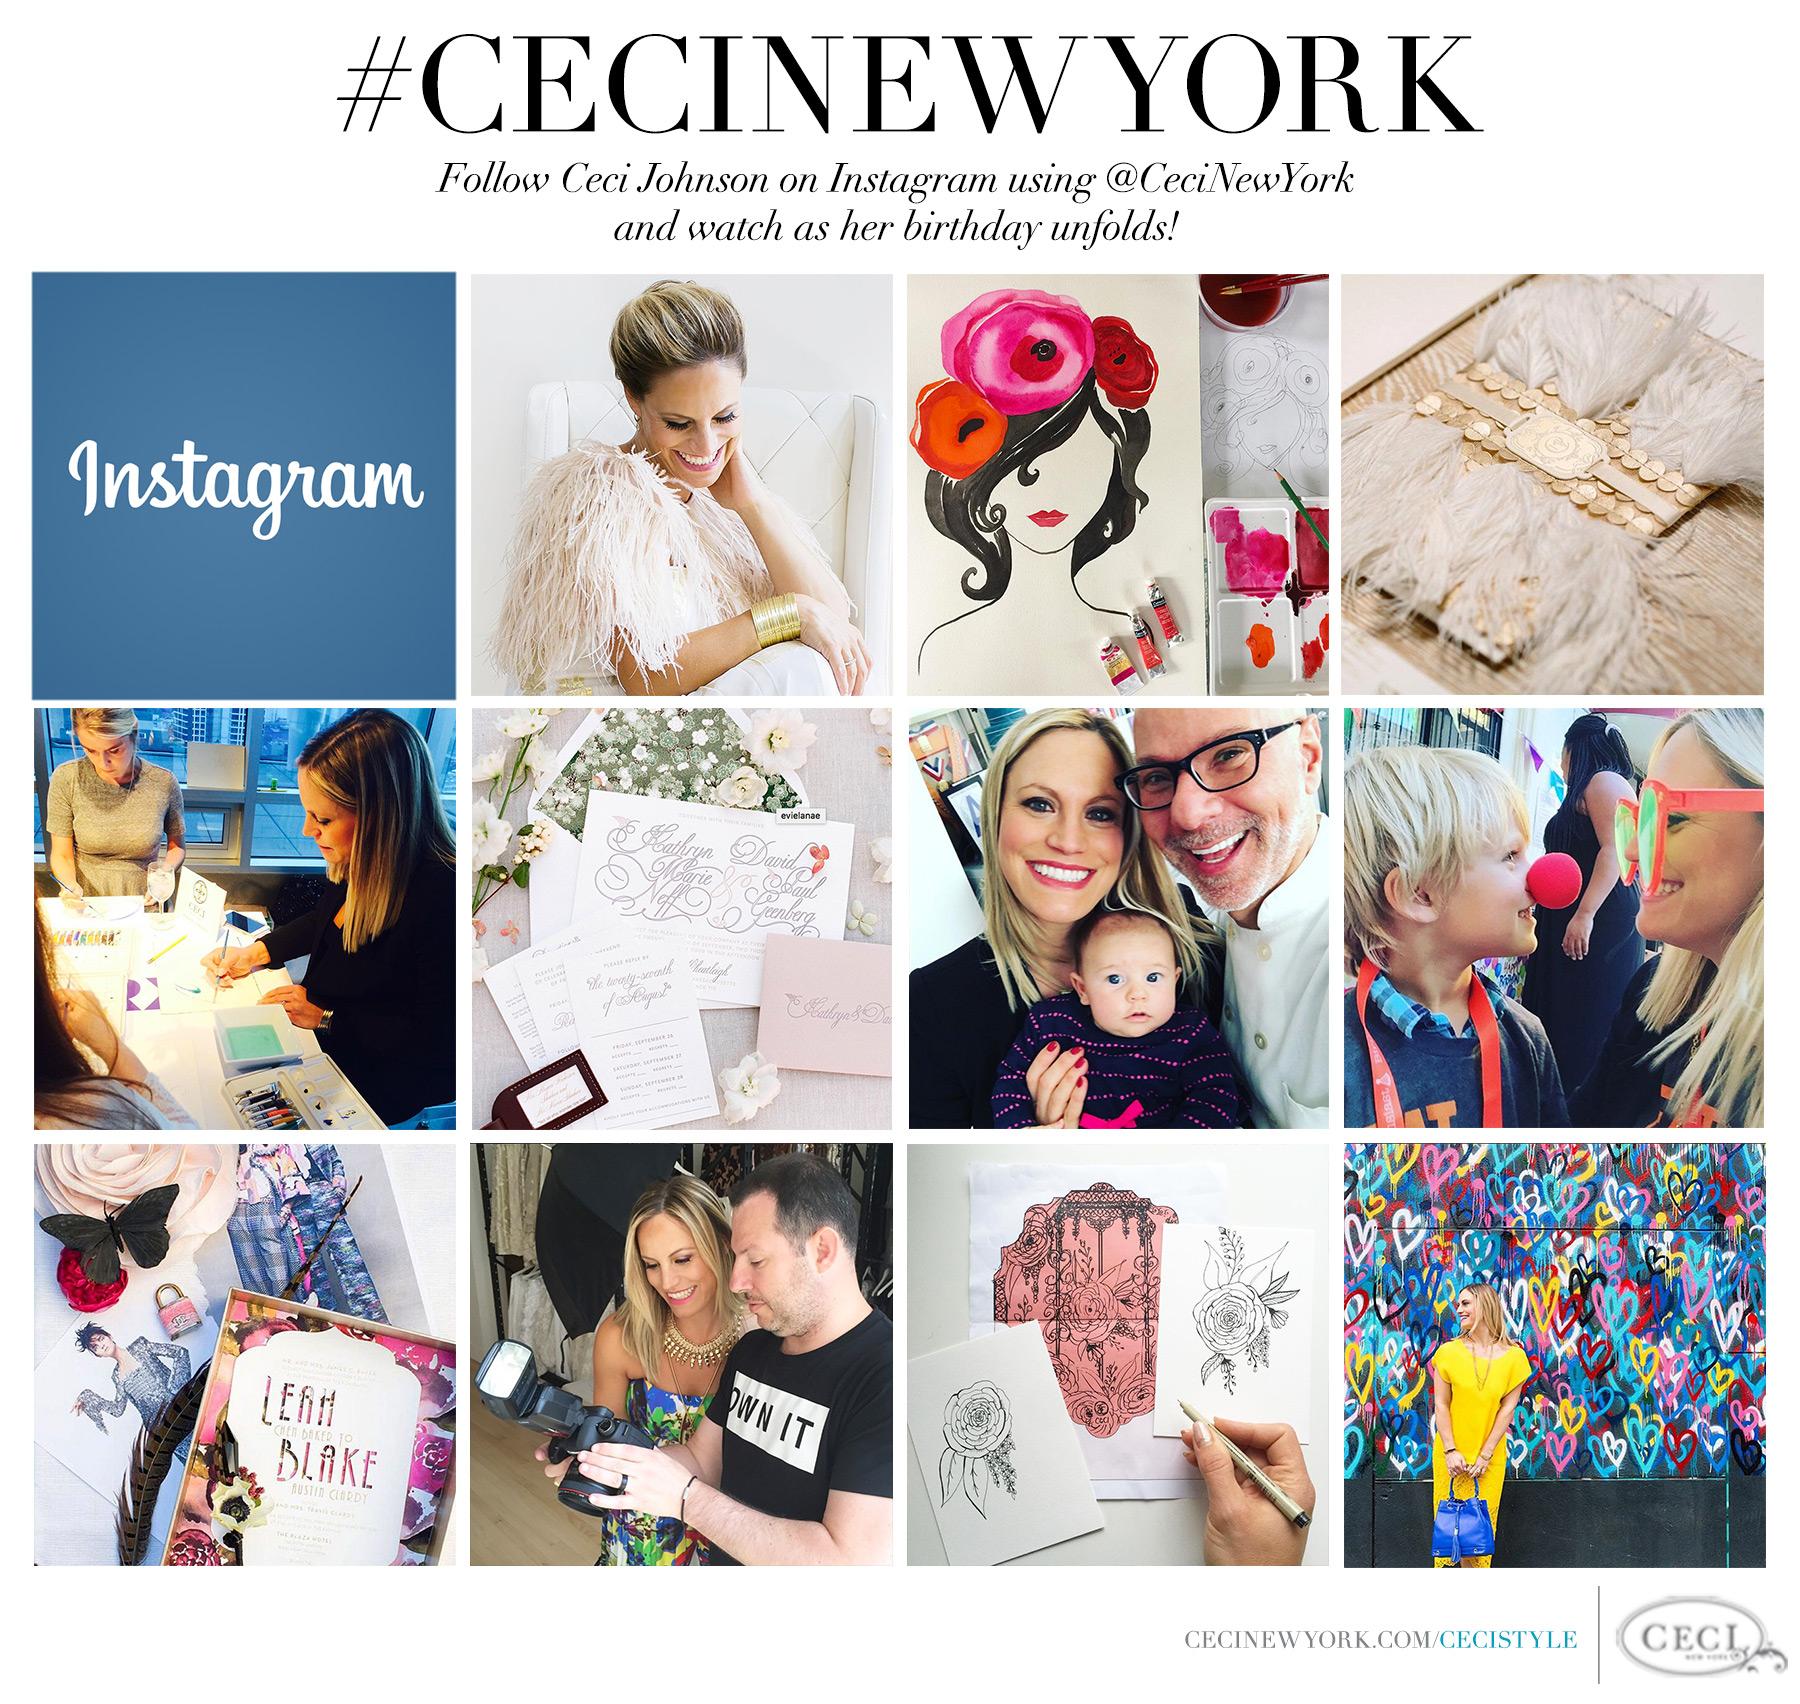 #CeciNewYork – Follow Ceci Johnson on Instagram using @CeciNewYork and watch as her birthday unfolds!